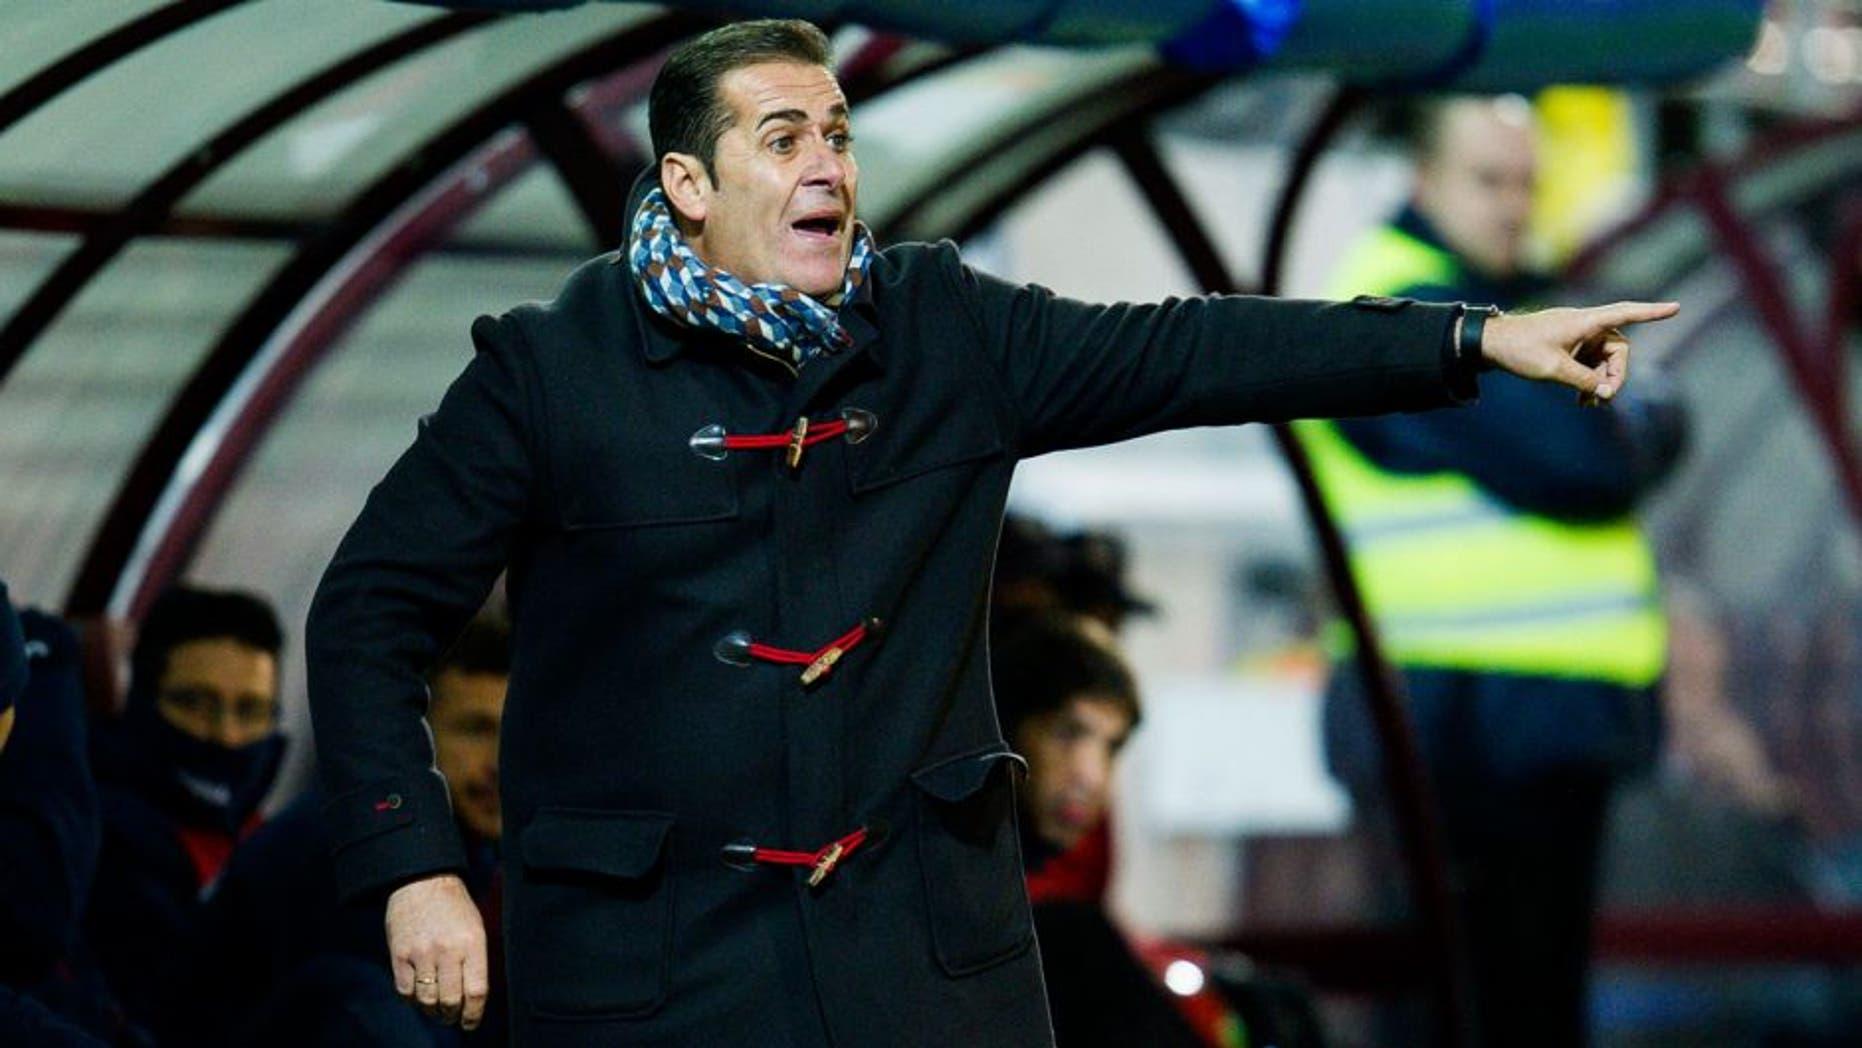 EIBAR, SPAIN - JANUARY 18: Head coach Jose Ramon Sandoval of Granada CF reacts during the La Liga match between SD Eibar and Granada CF at Ipurua Municipal Stadium on January 18, 2016 in Eibar, Spain. (Photo by Juan Manuel Serrano Arce/Getty Images)